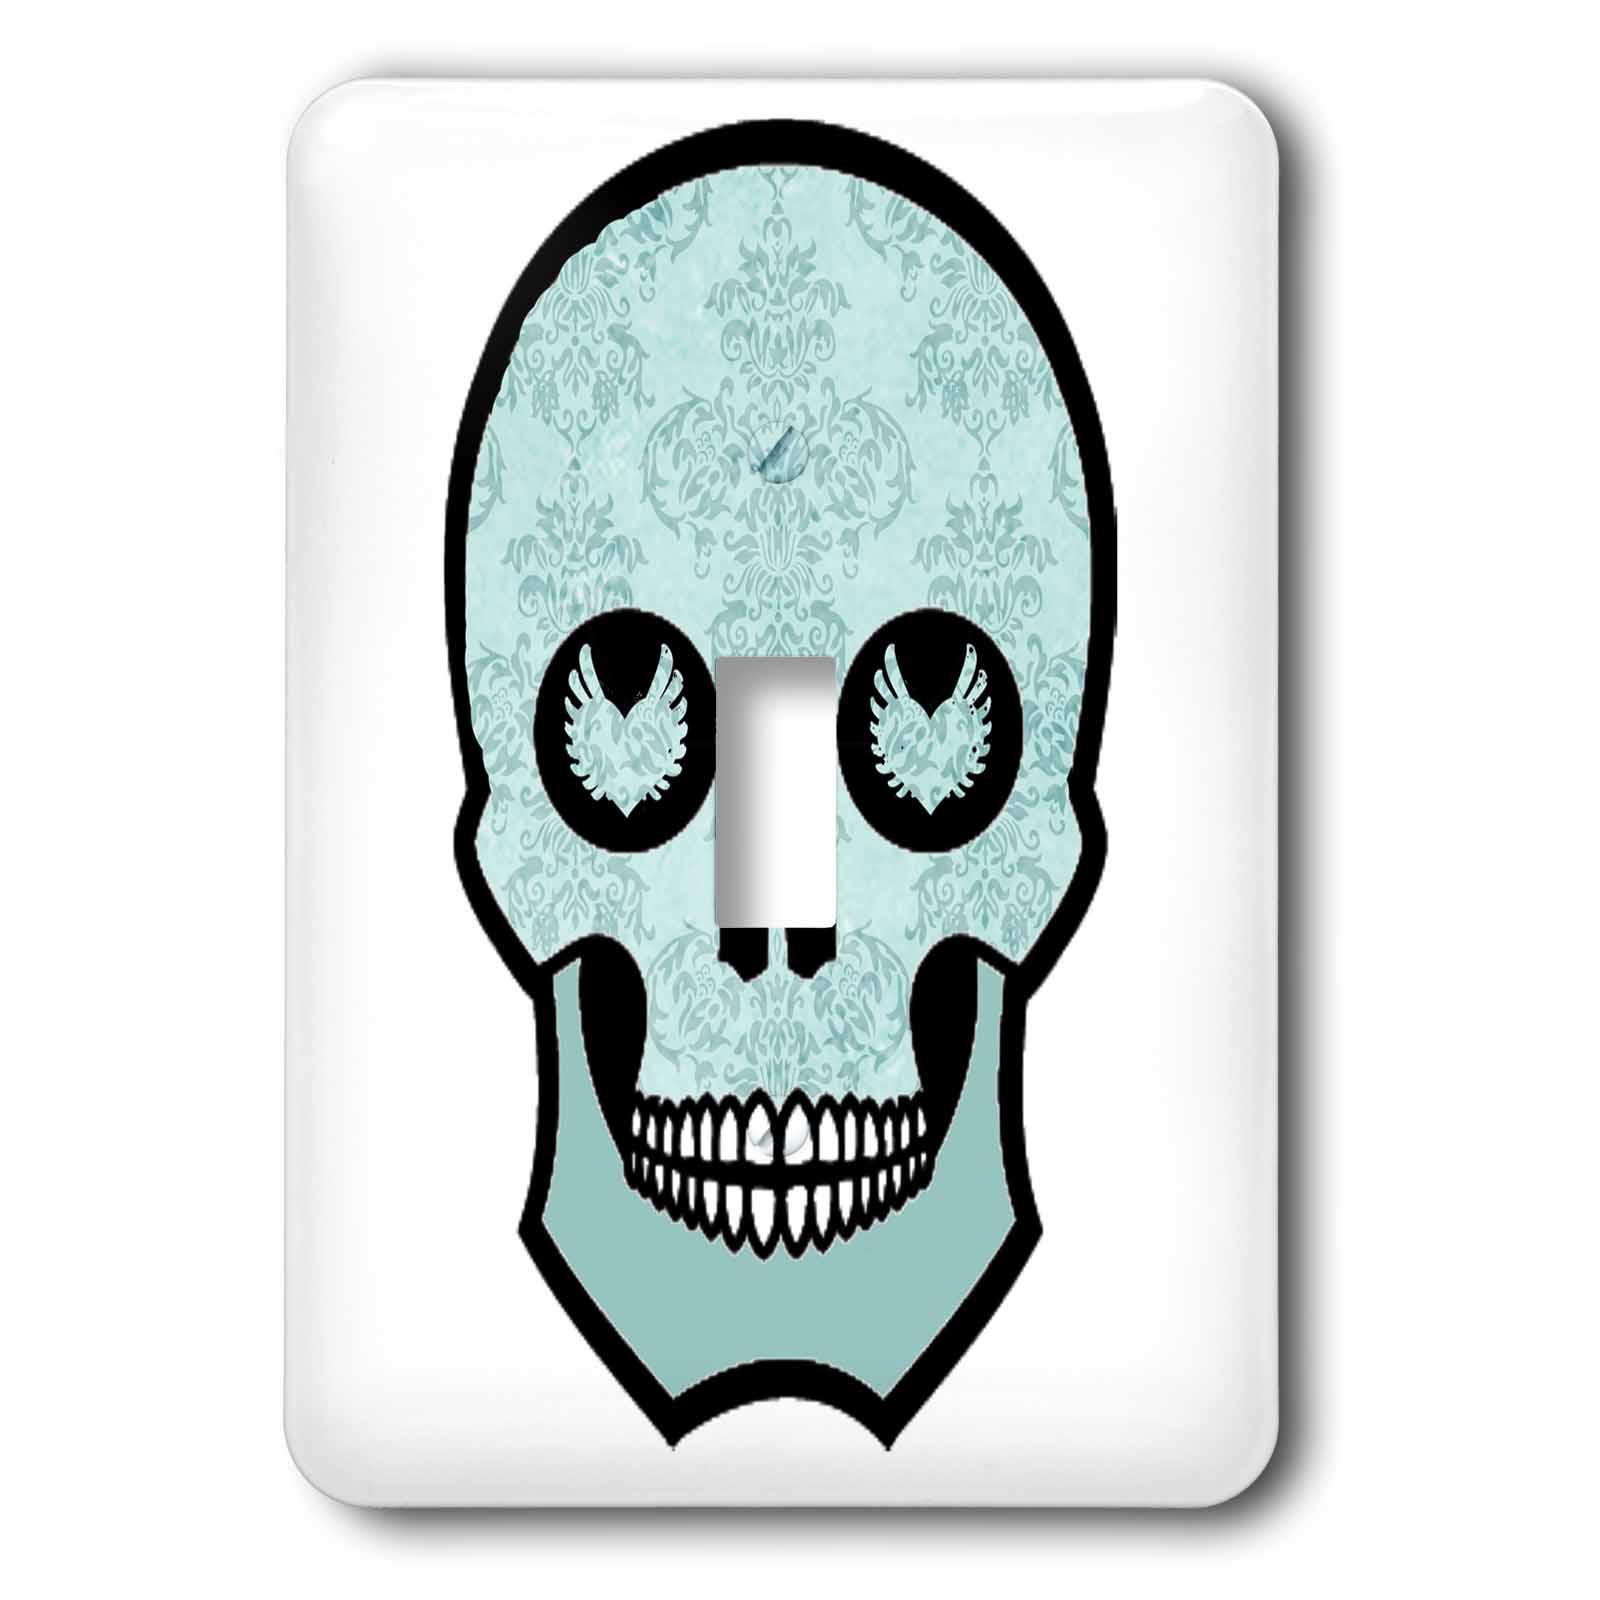 3dRose Light Blue Damask Skull, Single Toggle Switch